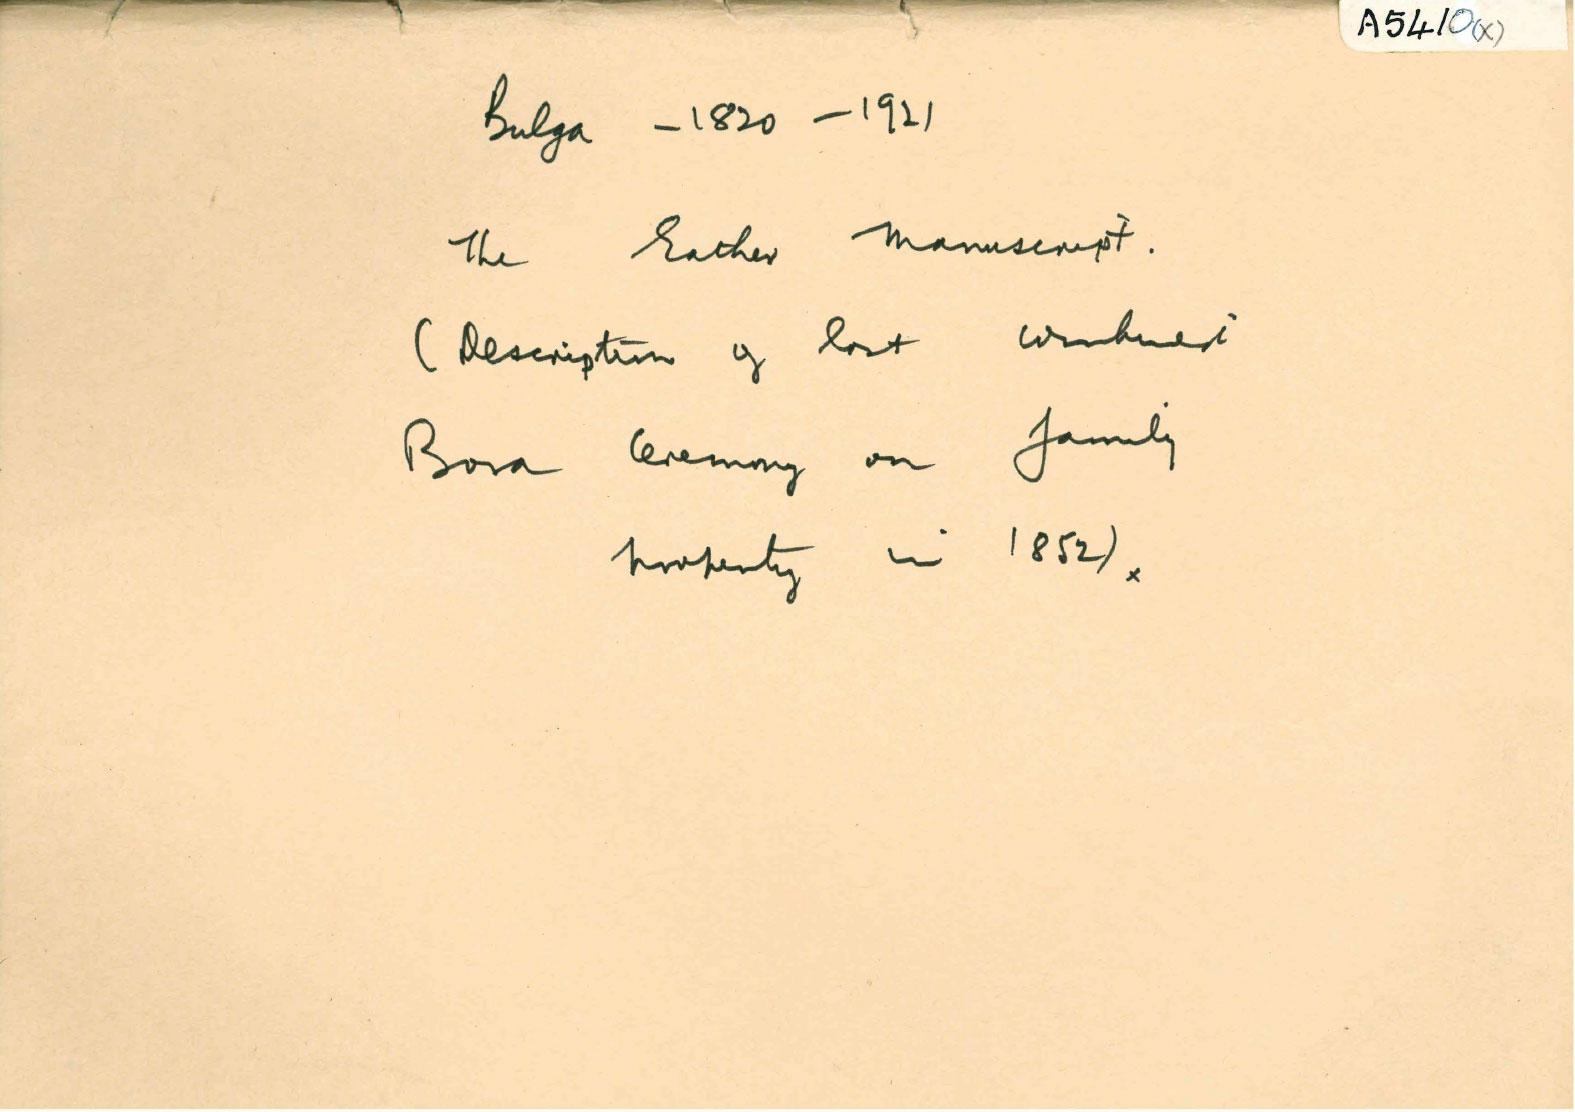 "A5410(x) - ""Bulga - 1820-1921 The Eather Manuscript. (Description of last combined Bora Ceremony on family property in 1852)"